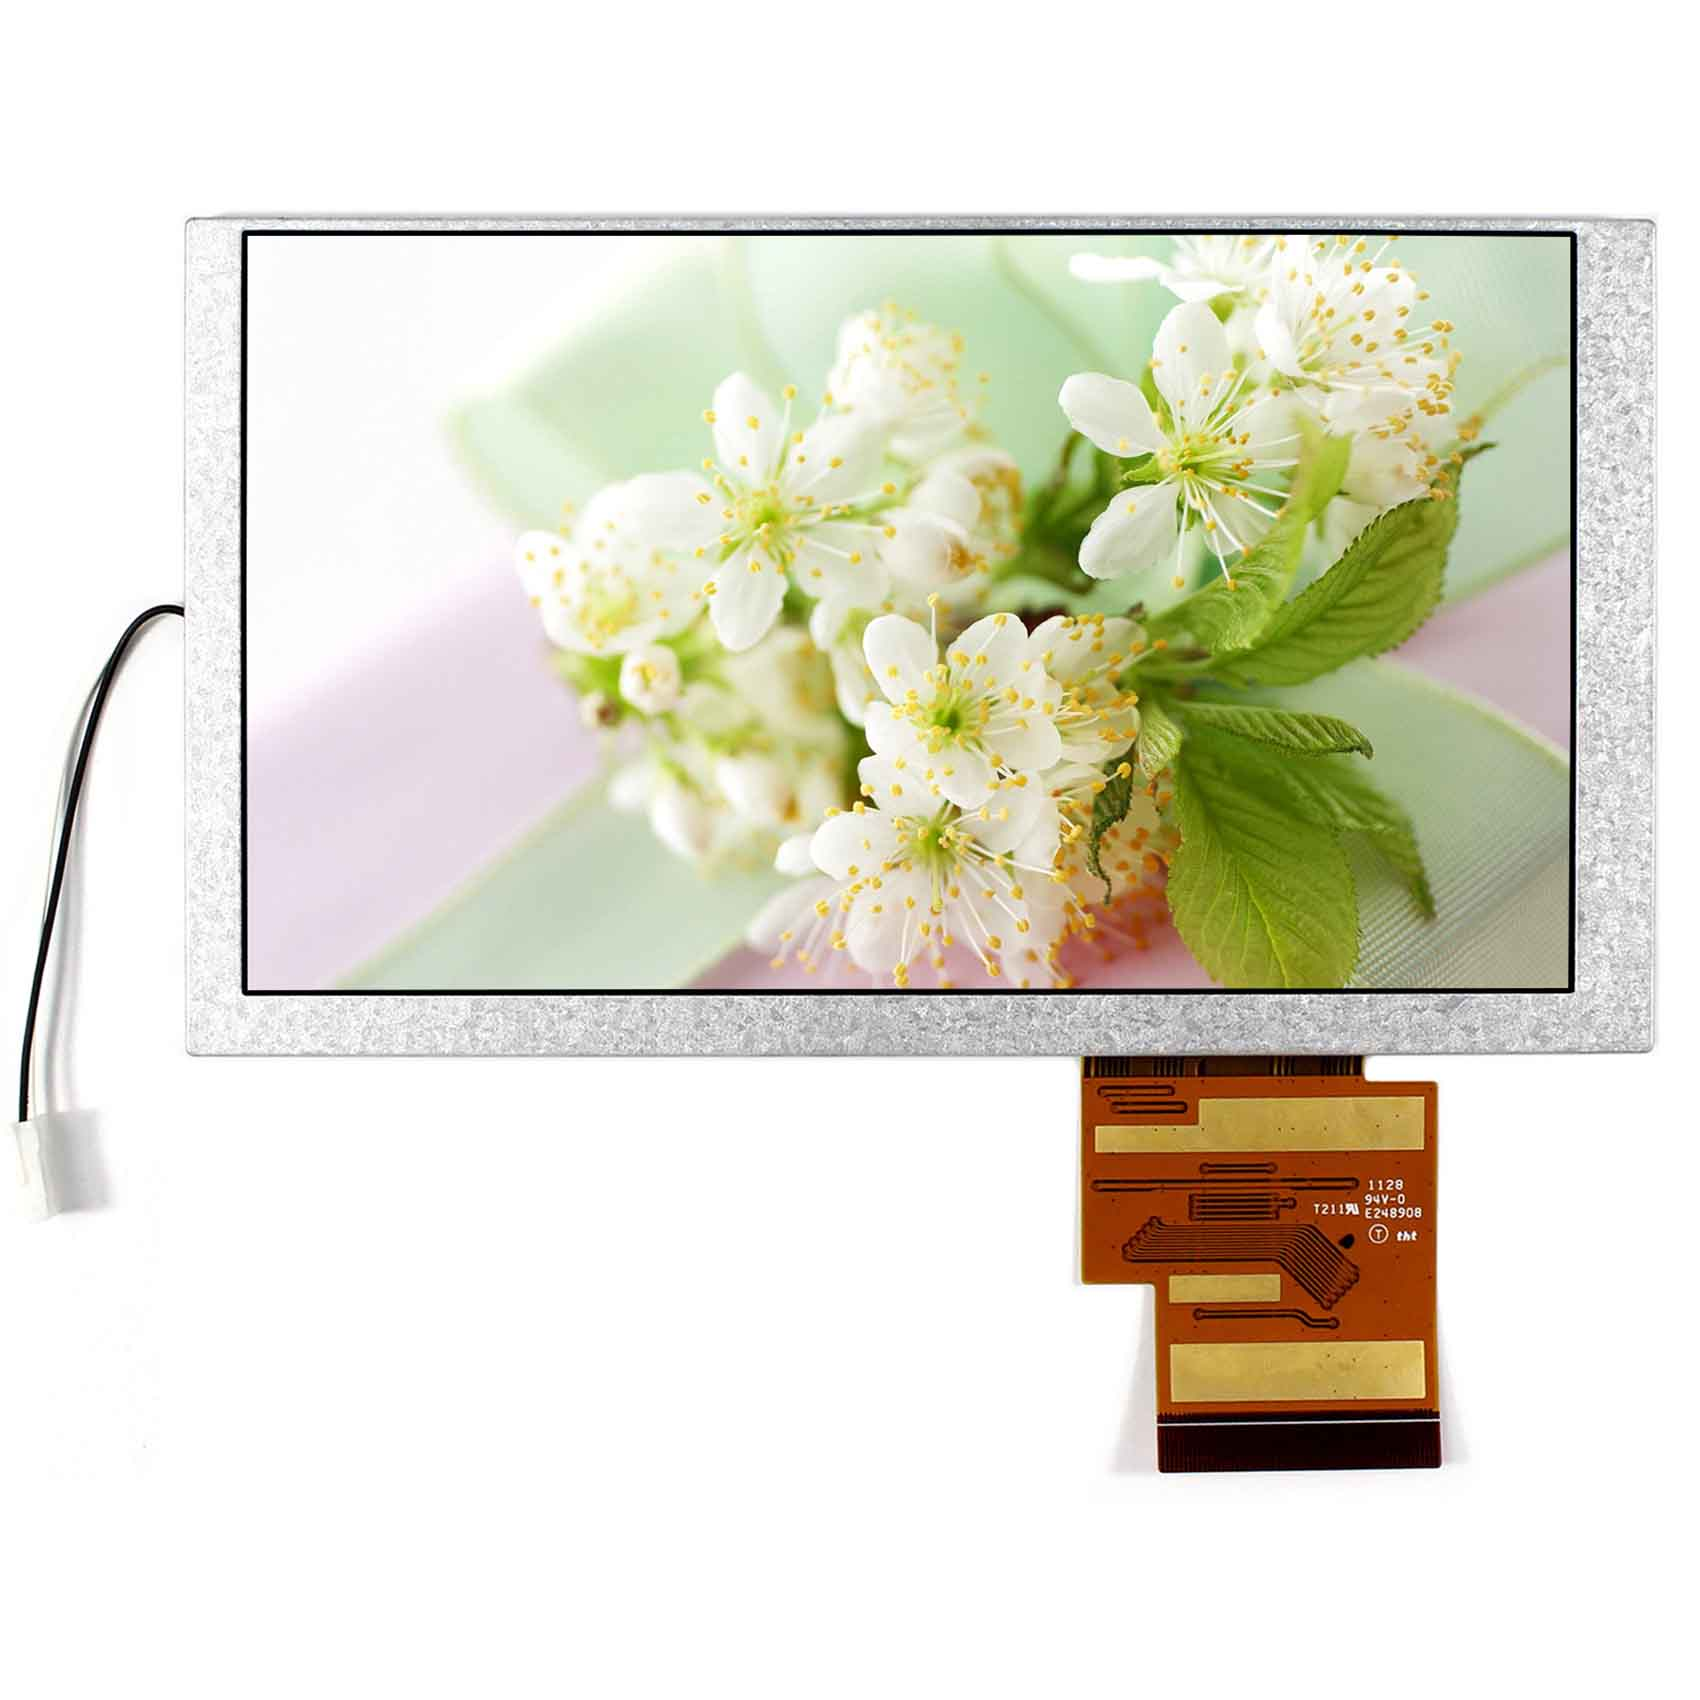 6.2 TFT LCD Display 800x480 HSD062IDW1 60P 6.2 TFT Display Color LCD